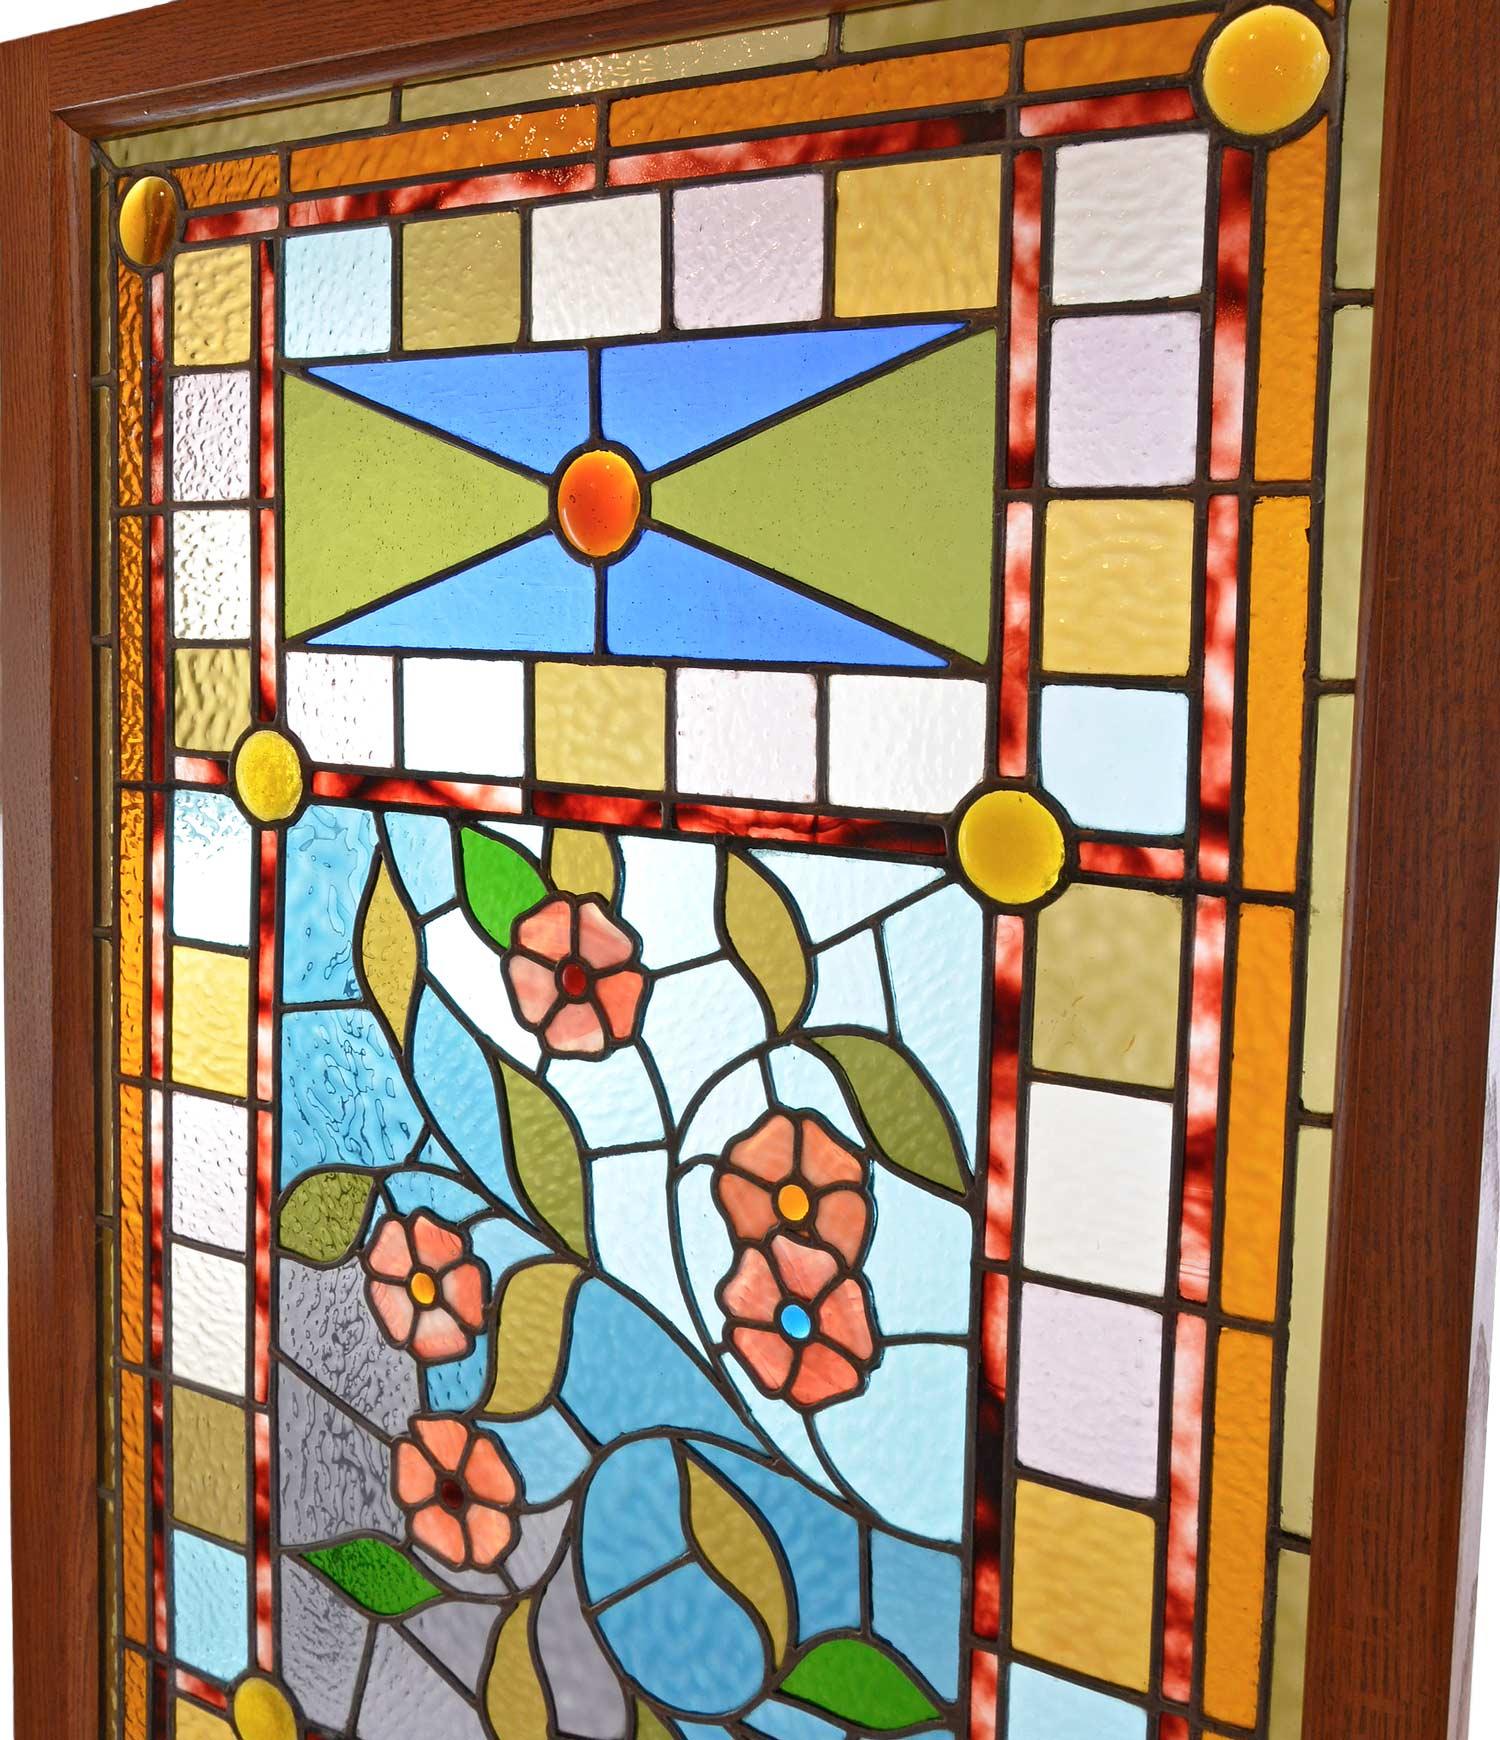 46377-aesthetic-victorian-floral-window-detail.jpg